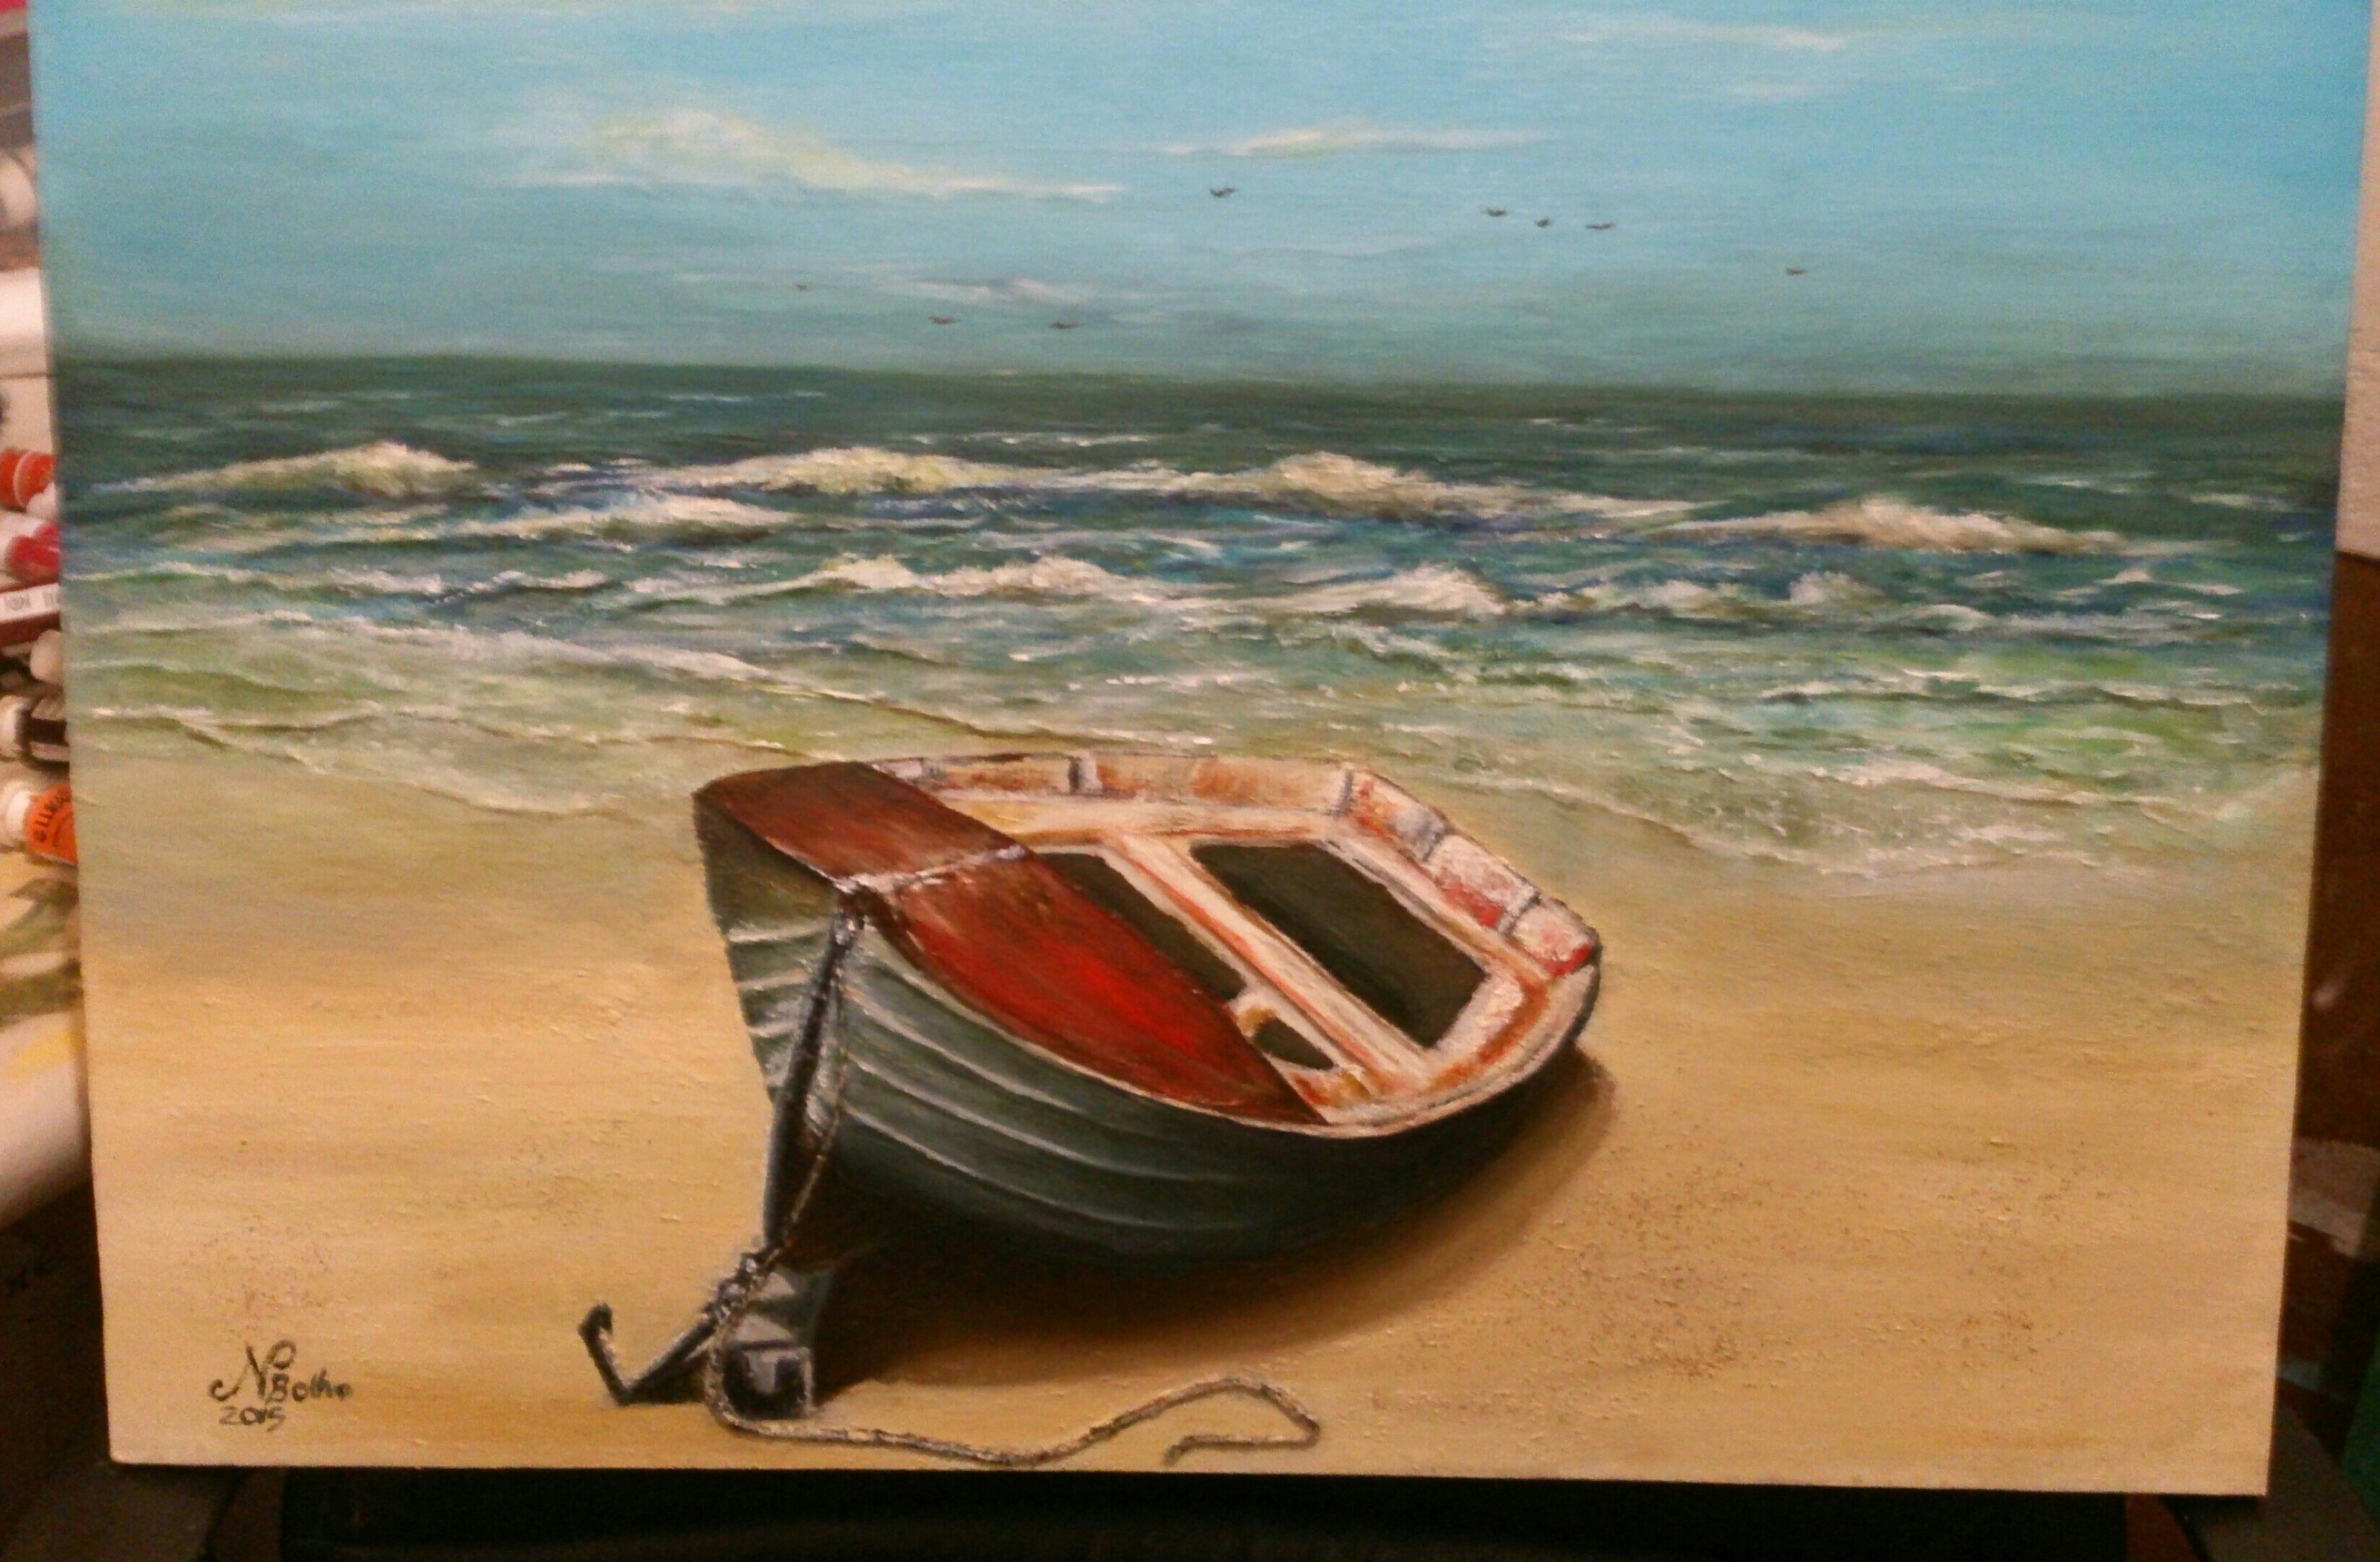 Ideal Row boat on sunny shore | Niklaas-1989 | Foundmyself KZ89